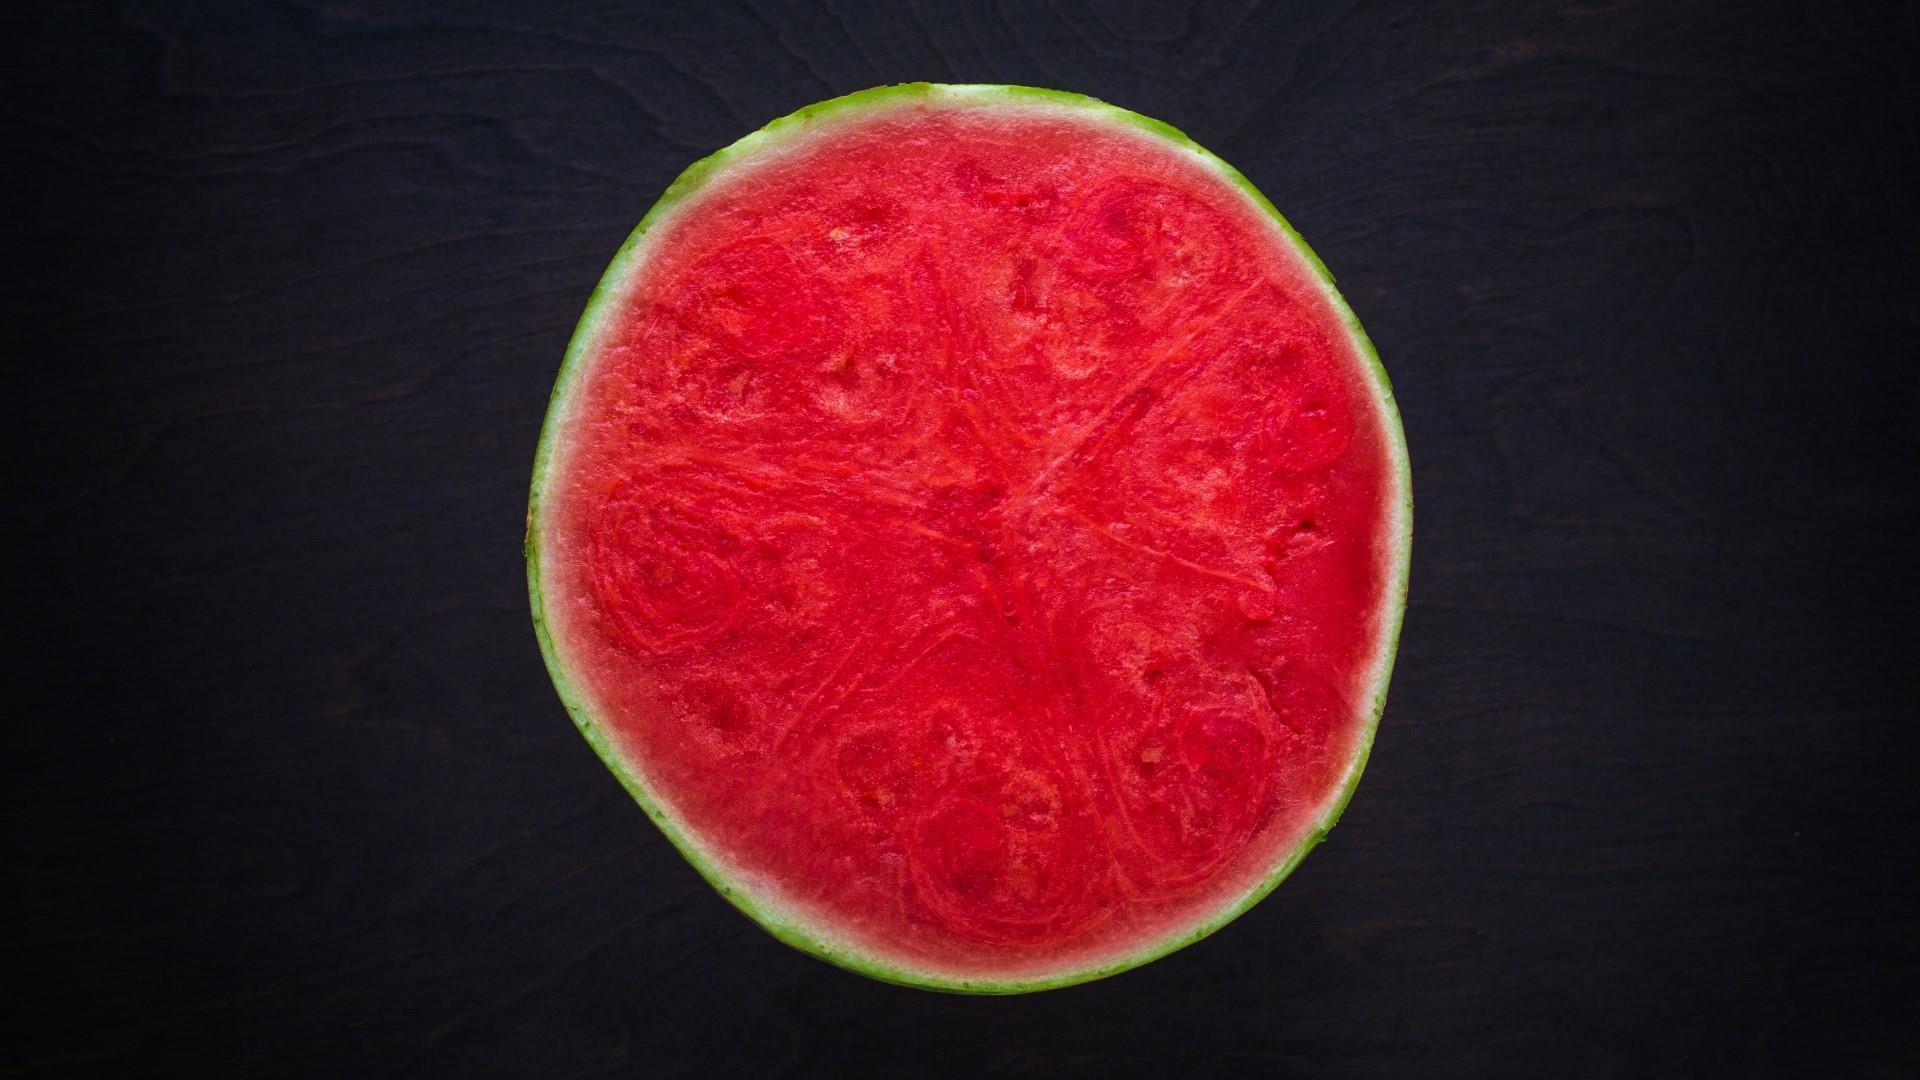 watermelon cartoon images